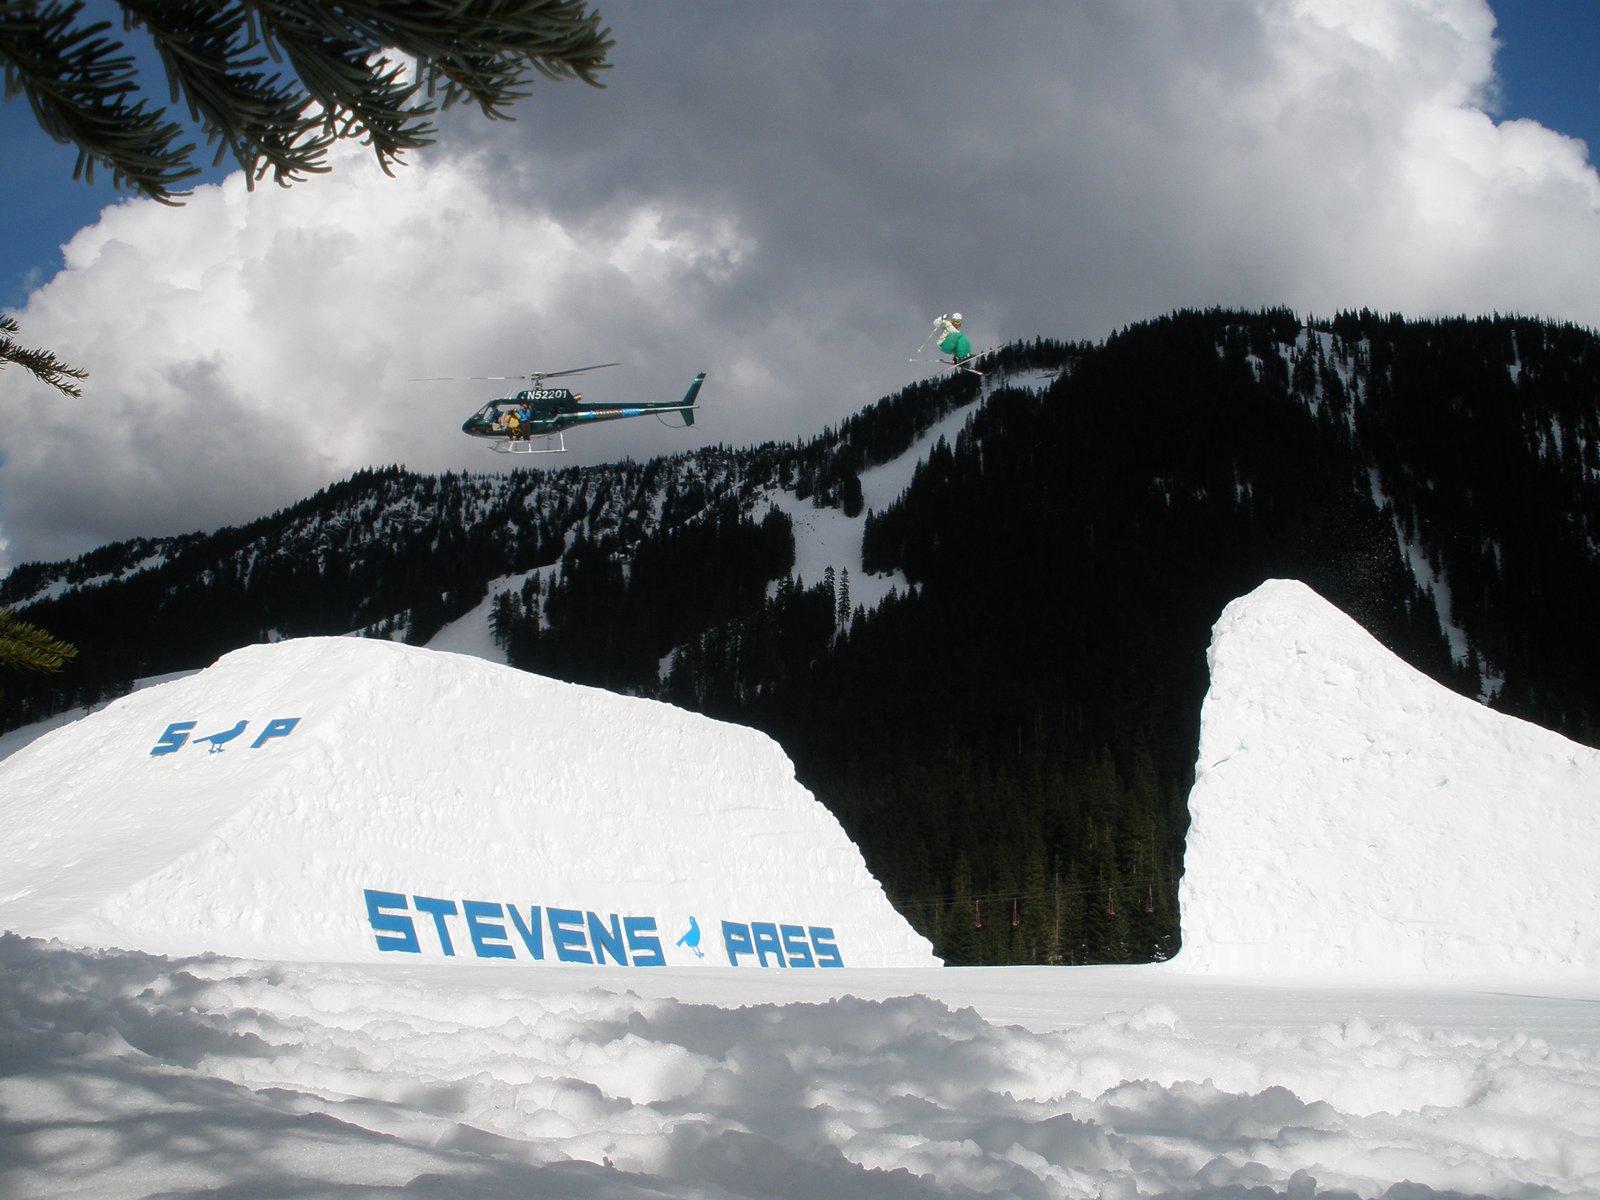 TGR Shoot at stevens pass